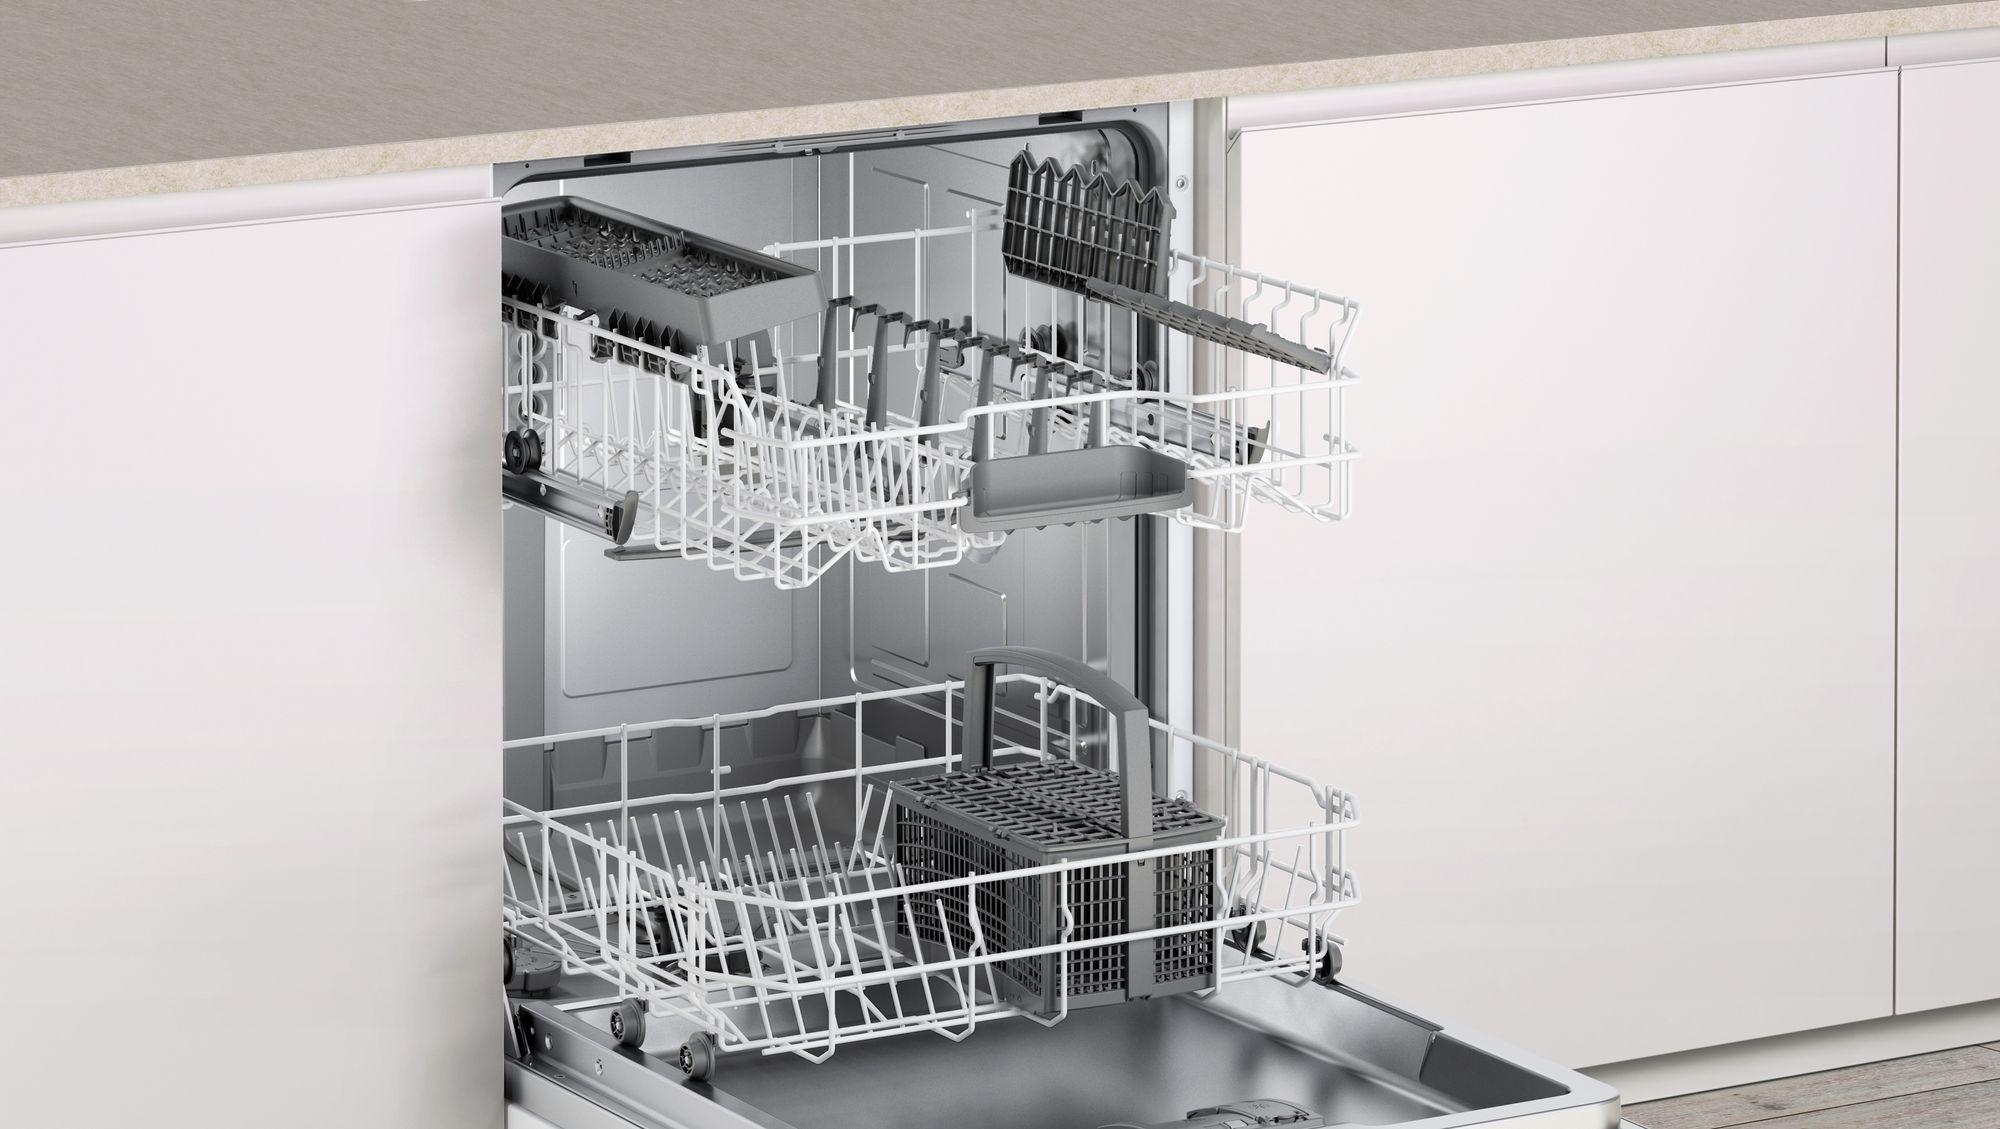 geschirrsp ler vollintegrierbar cg4a05v9 60cm. Black Bedroom Furniture Sets. Home Design Ideas